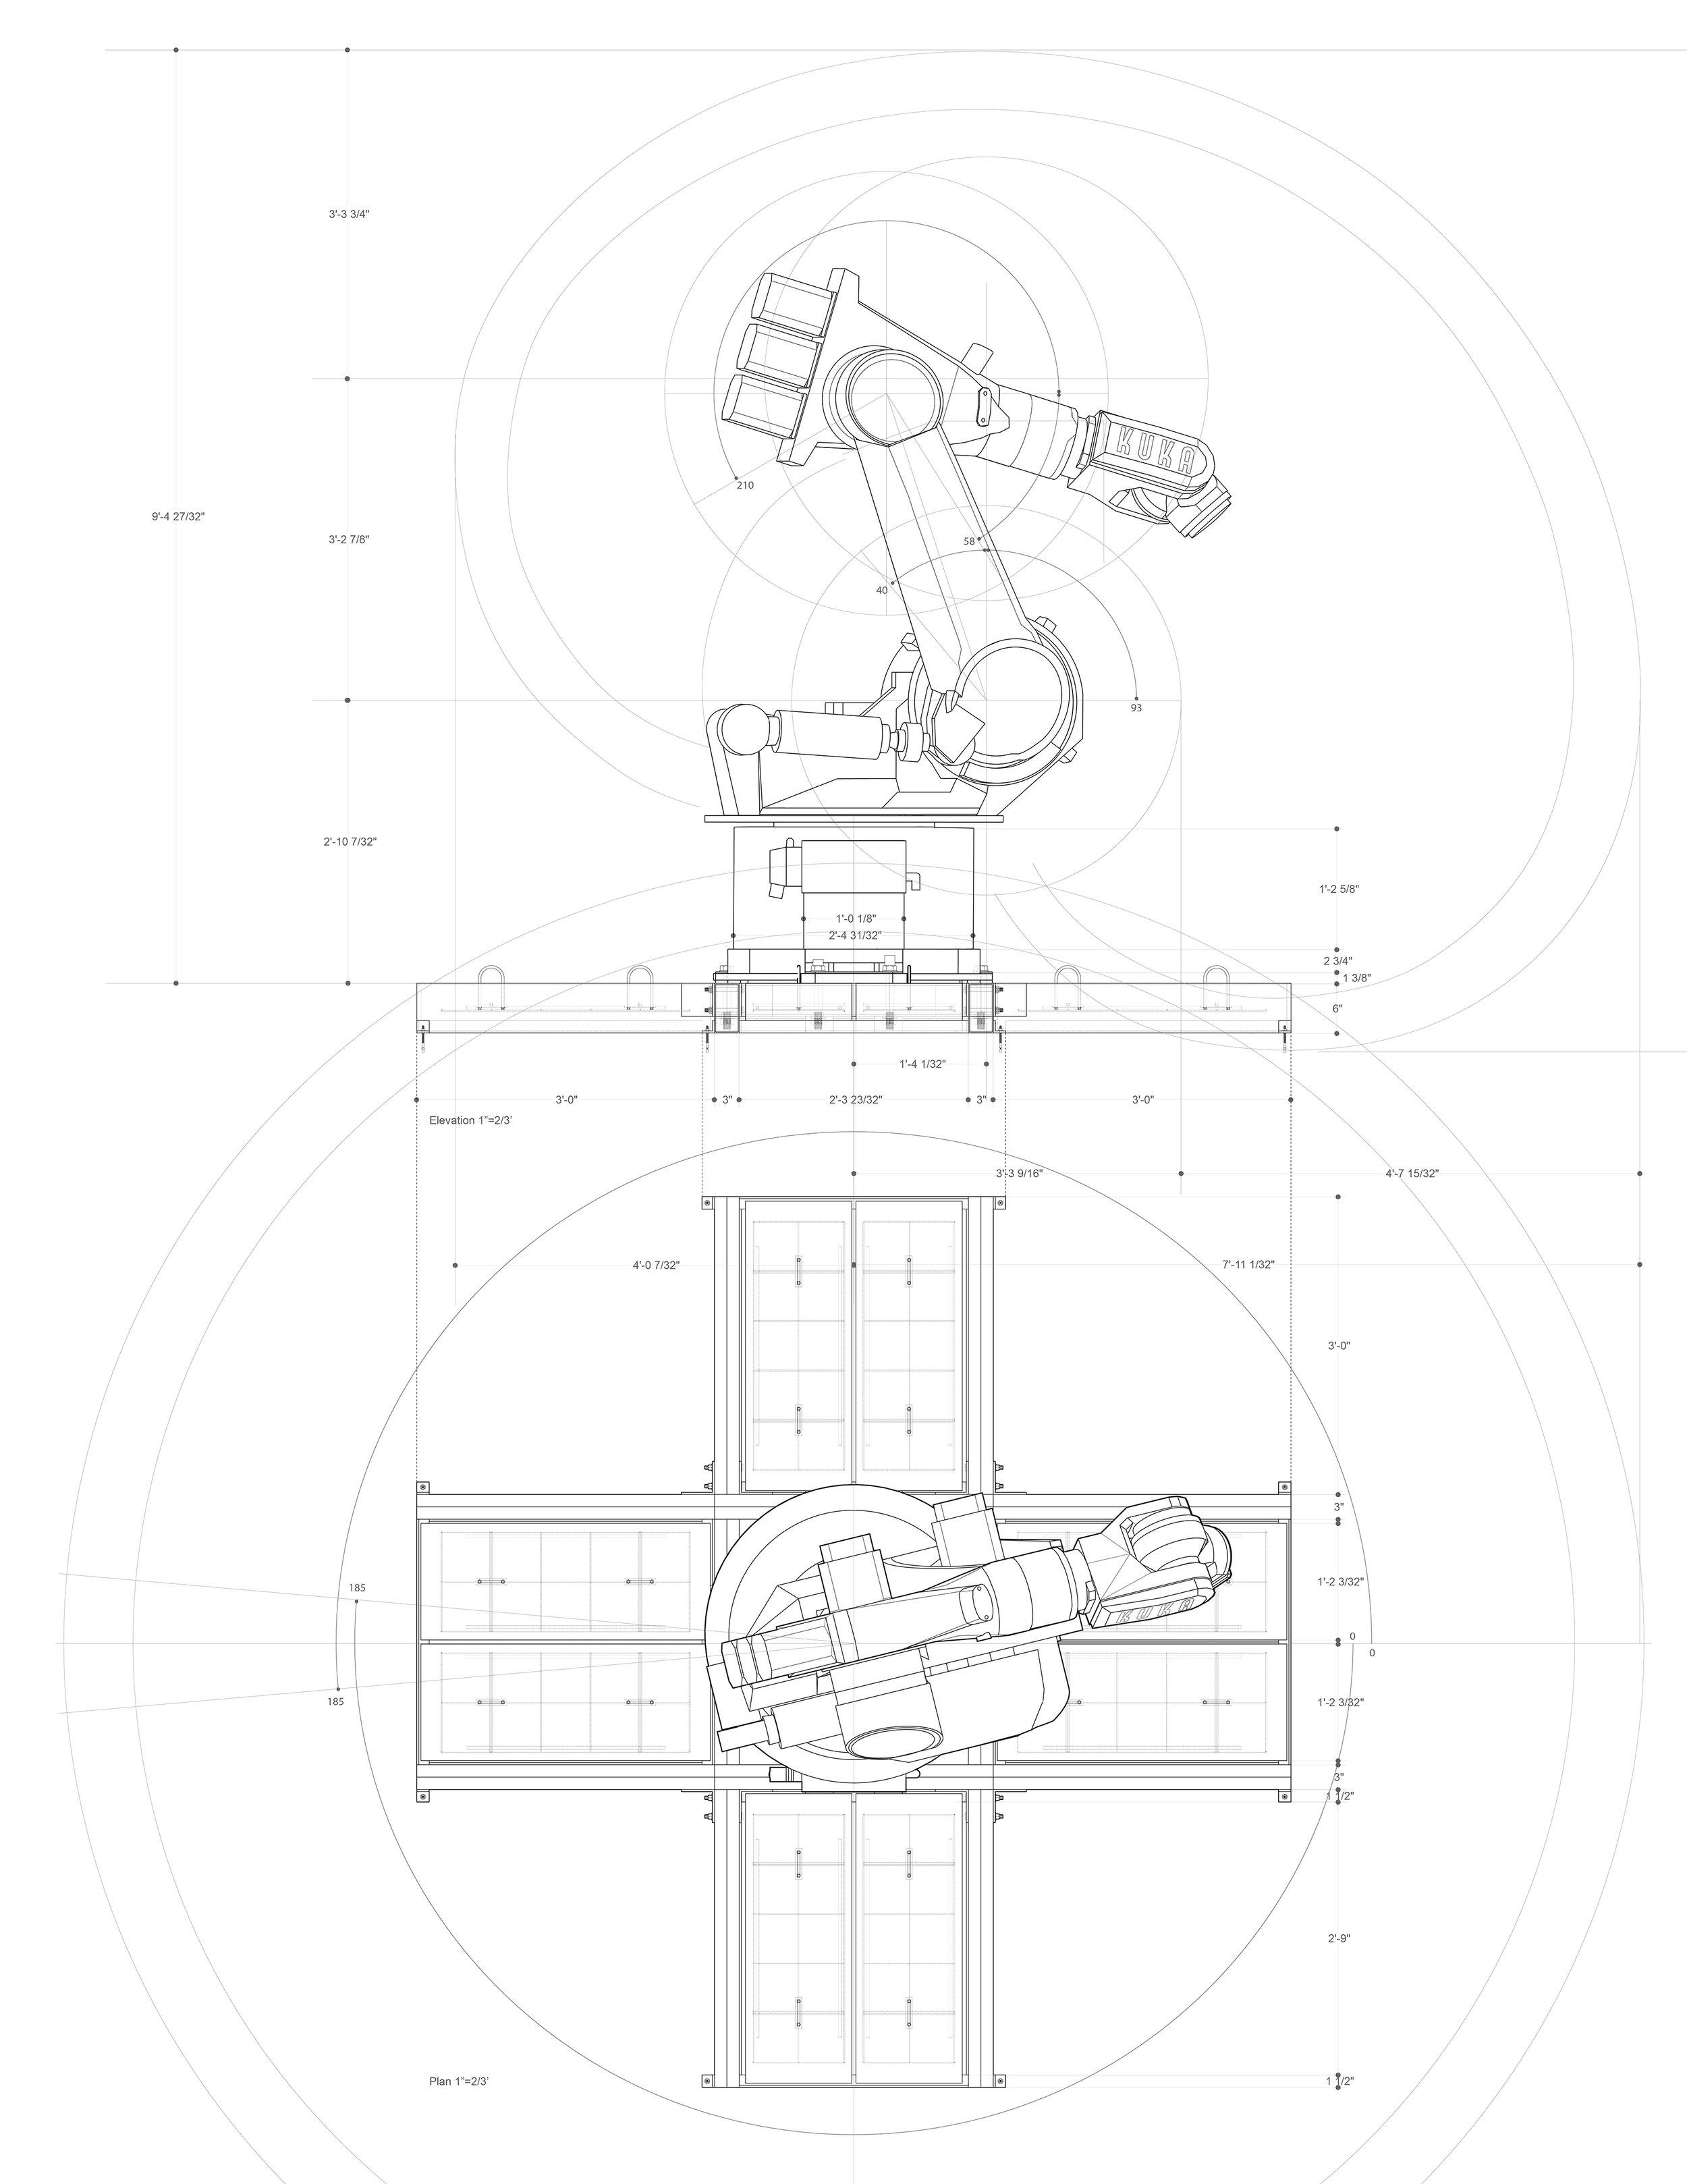 Kuka Kr-200 Elevation/ Plan